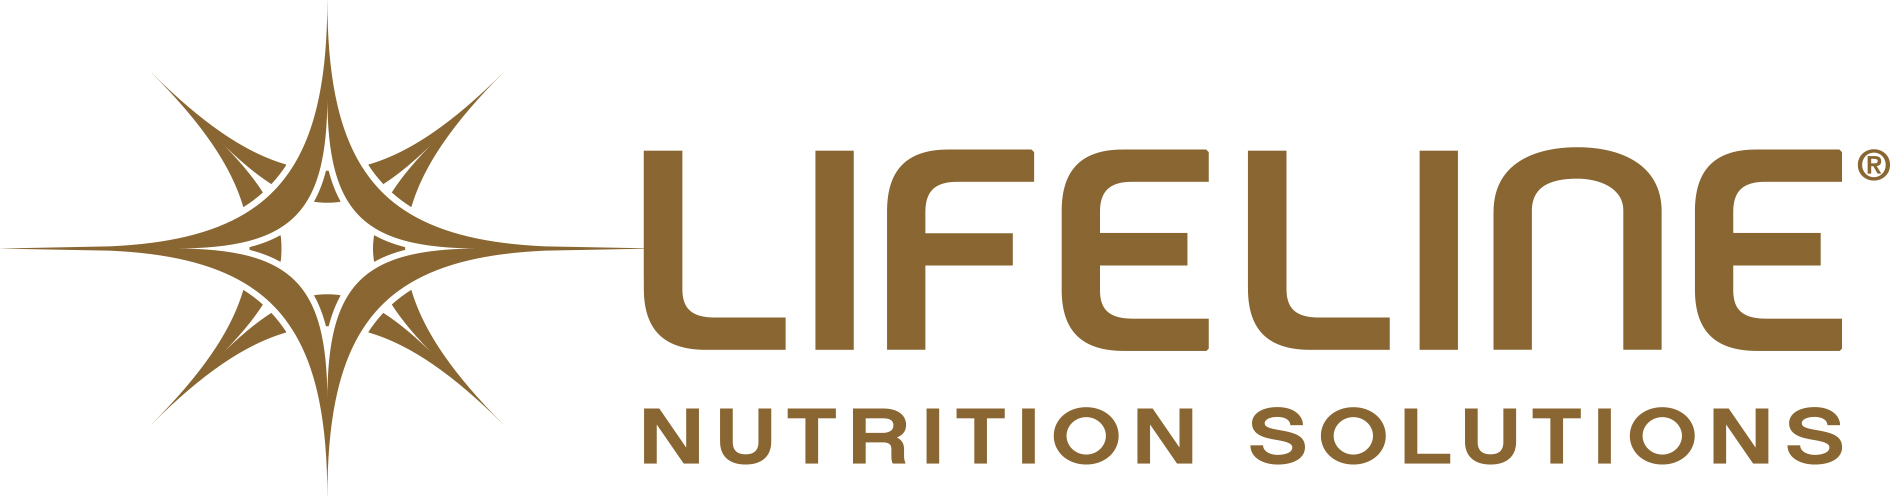 LL Rev Outlined Logo-7505-Horz_LS